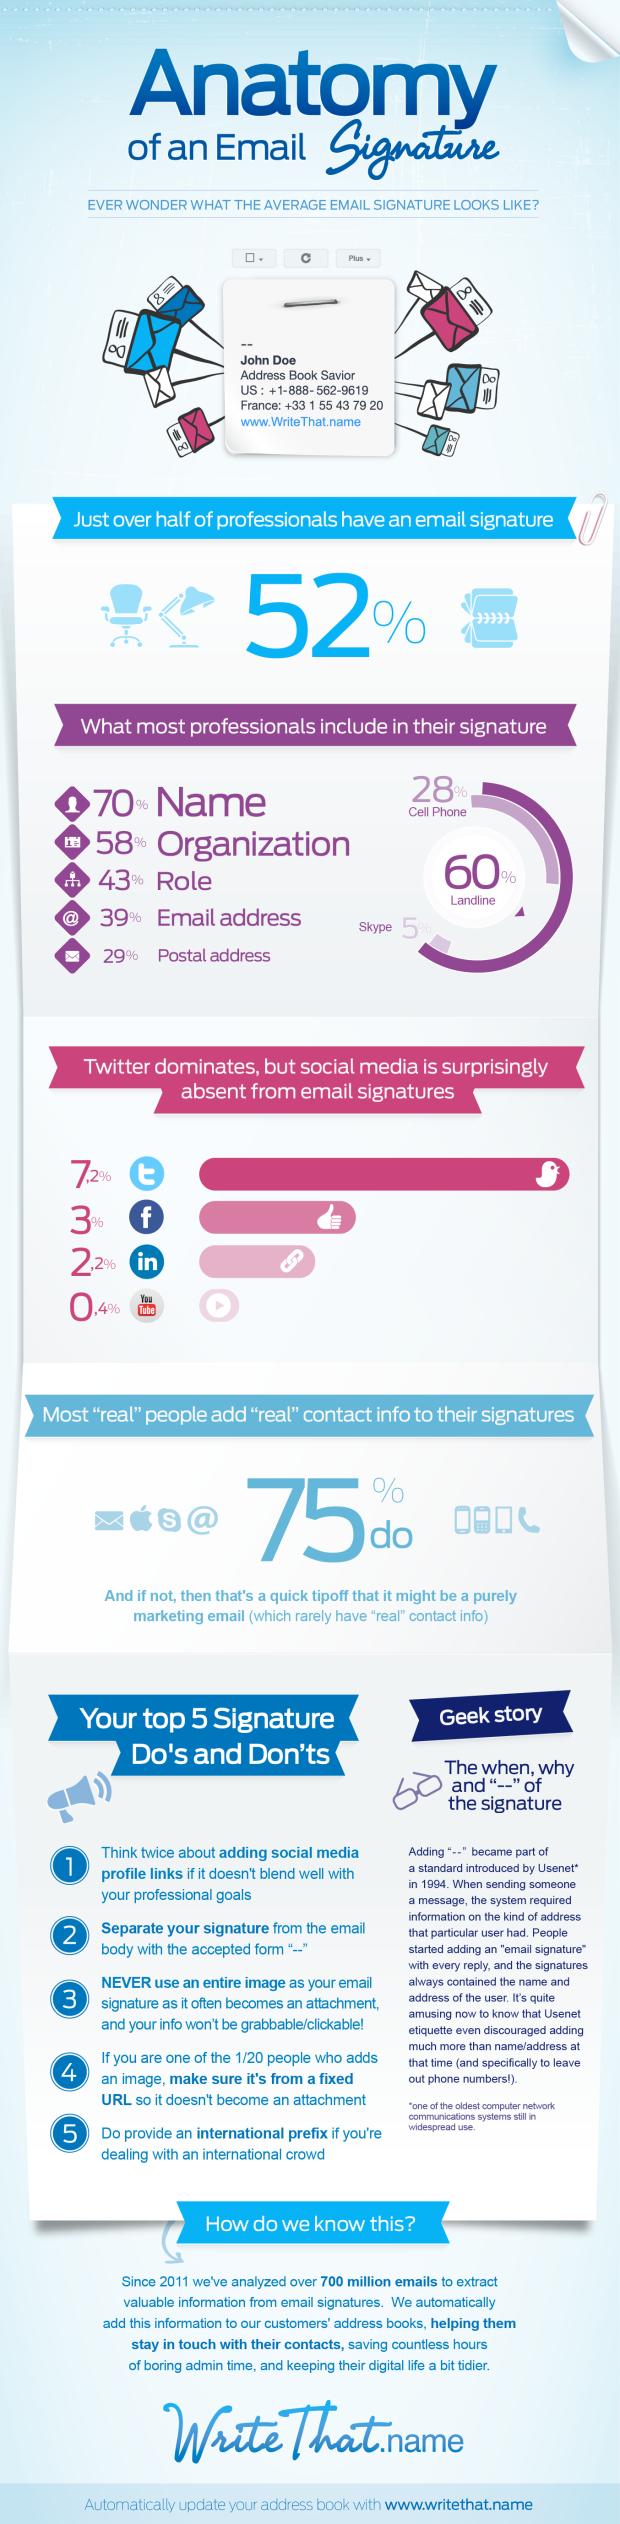 WriteThatname_Infographic_Anatomy_of_Email_Signature